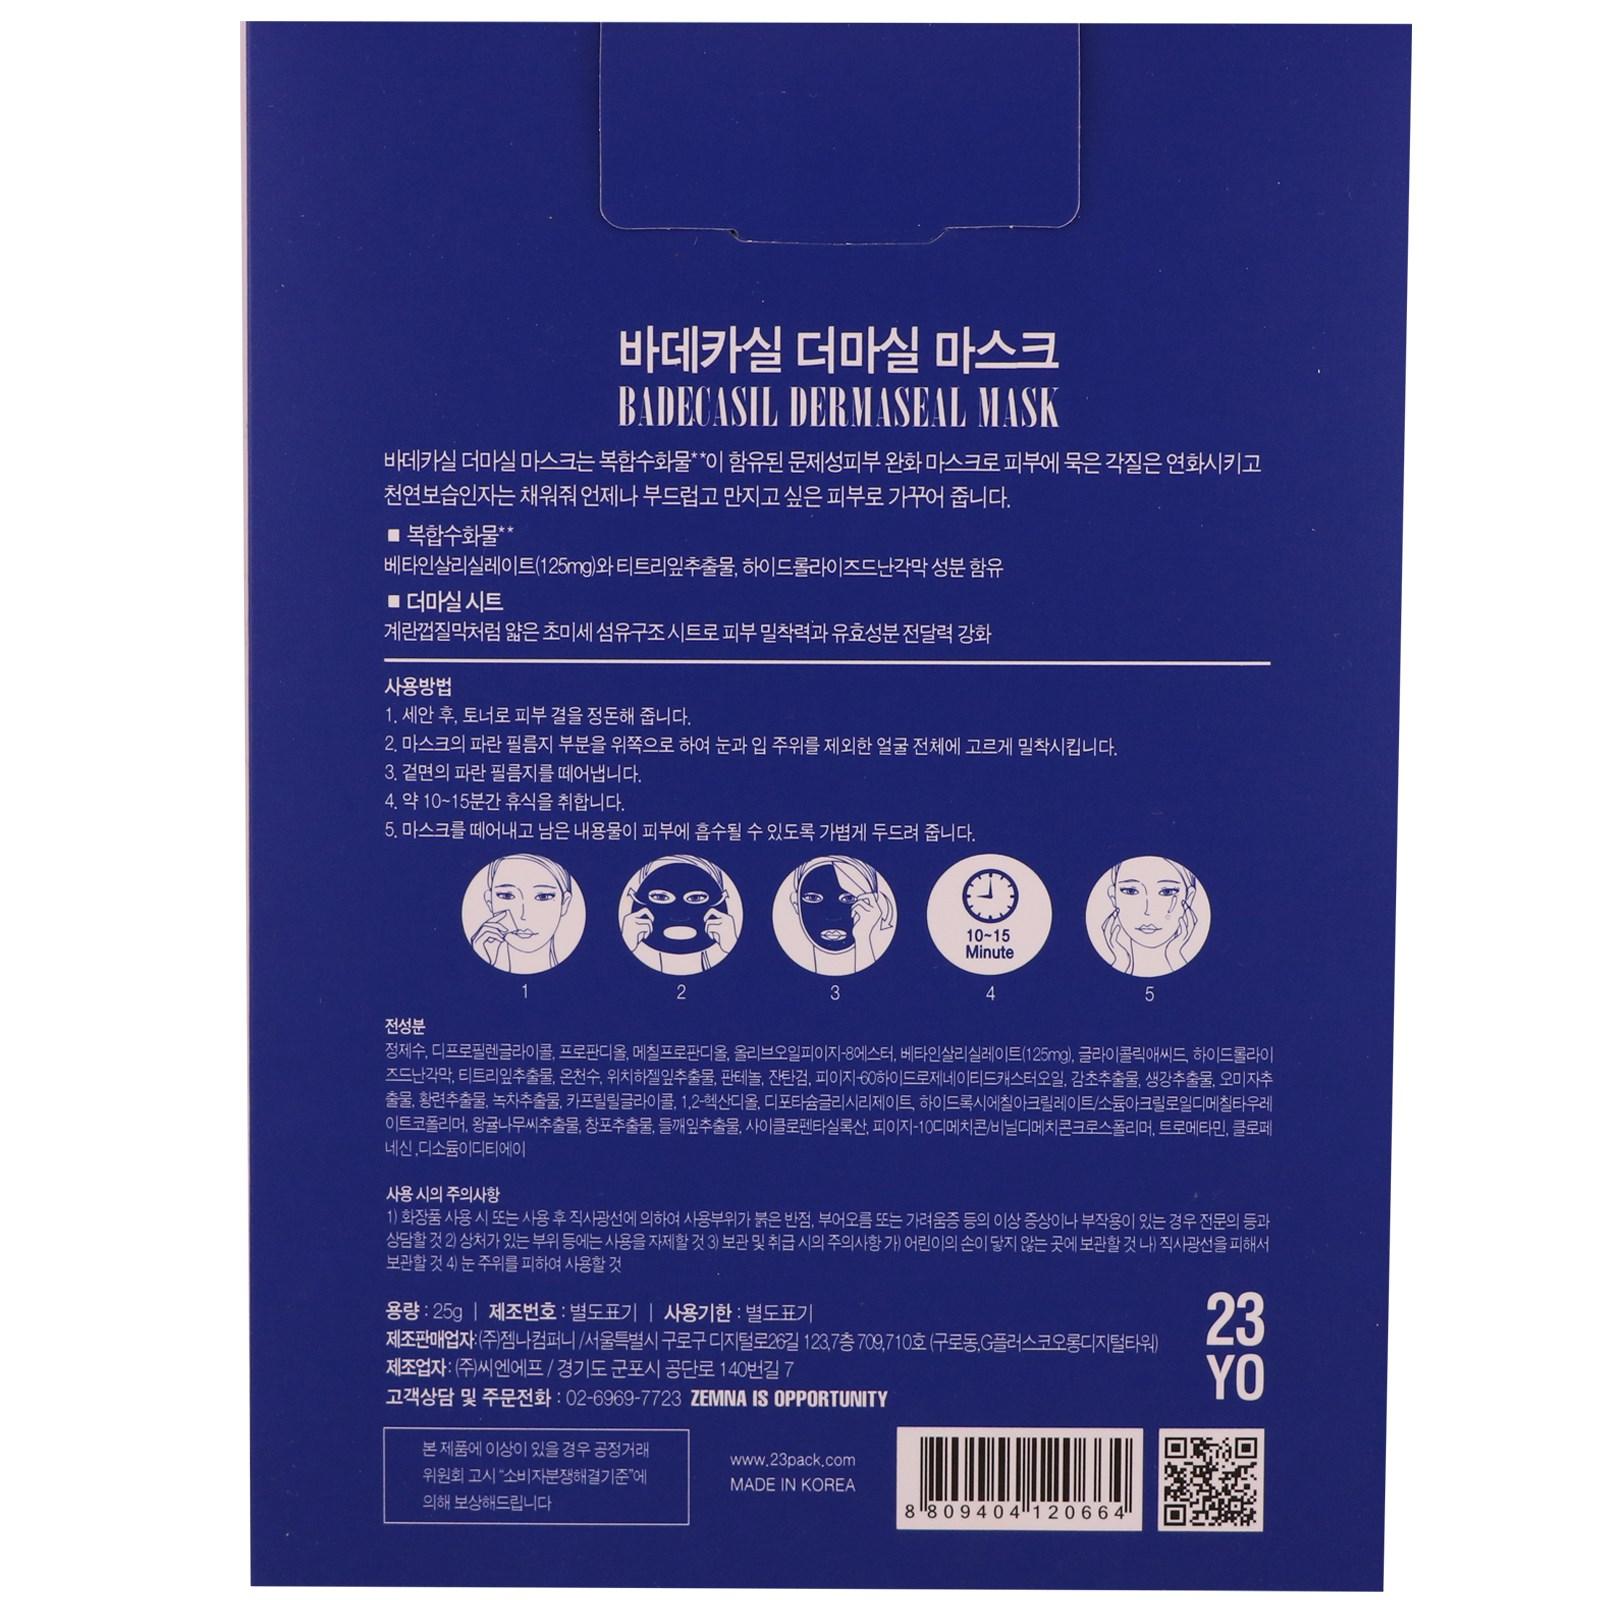 23 Years Old, Badecasil, Dermaseal Mask, 1 Sheet(pack of 12) Pimple Fighting Facial Deep Cleanser with Anti-Bacterial Formula 225mL By Eskinol